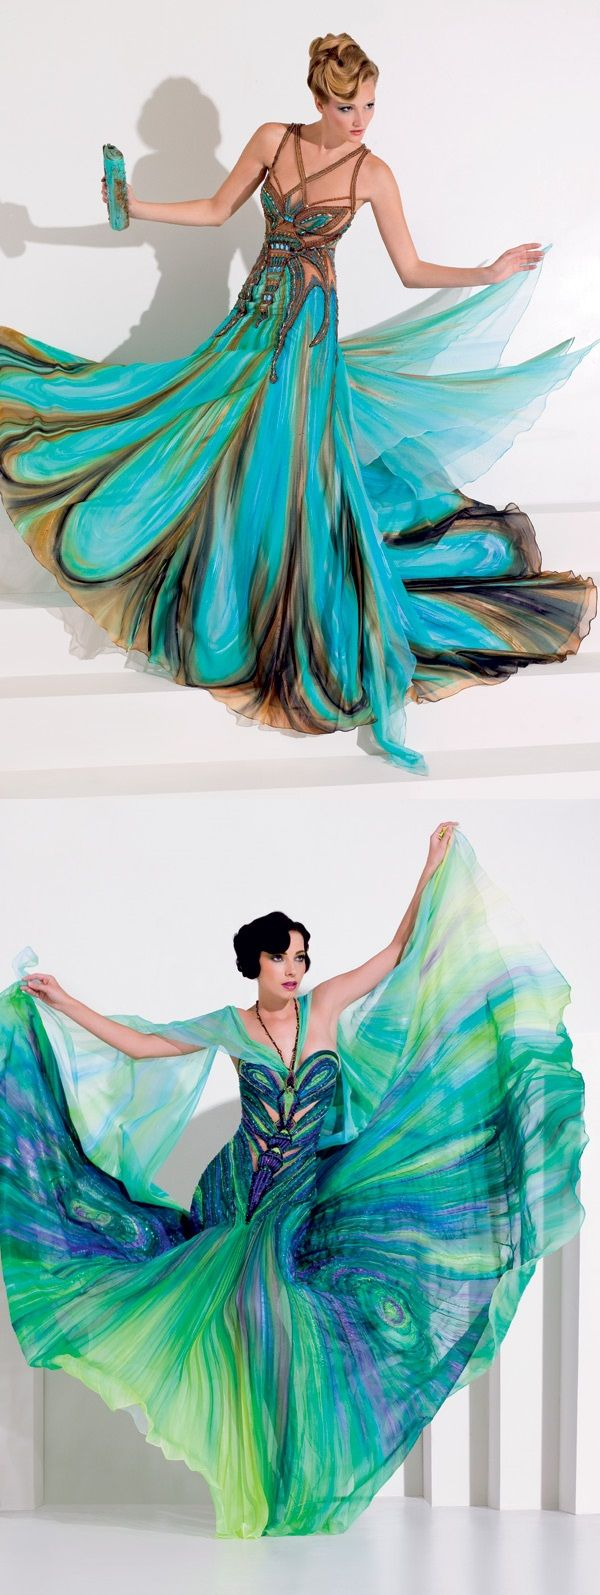 Amazing Dresses by Blanka Matragi- these dresses remind me of peacocks